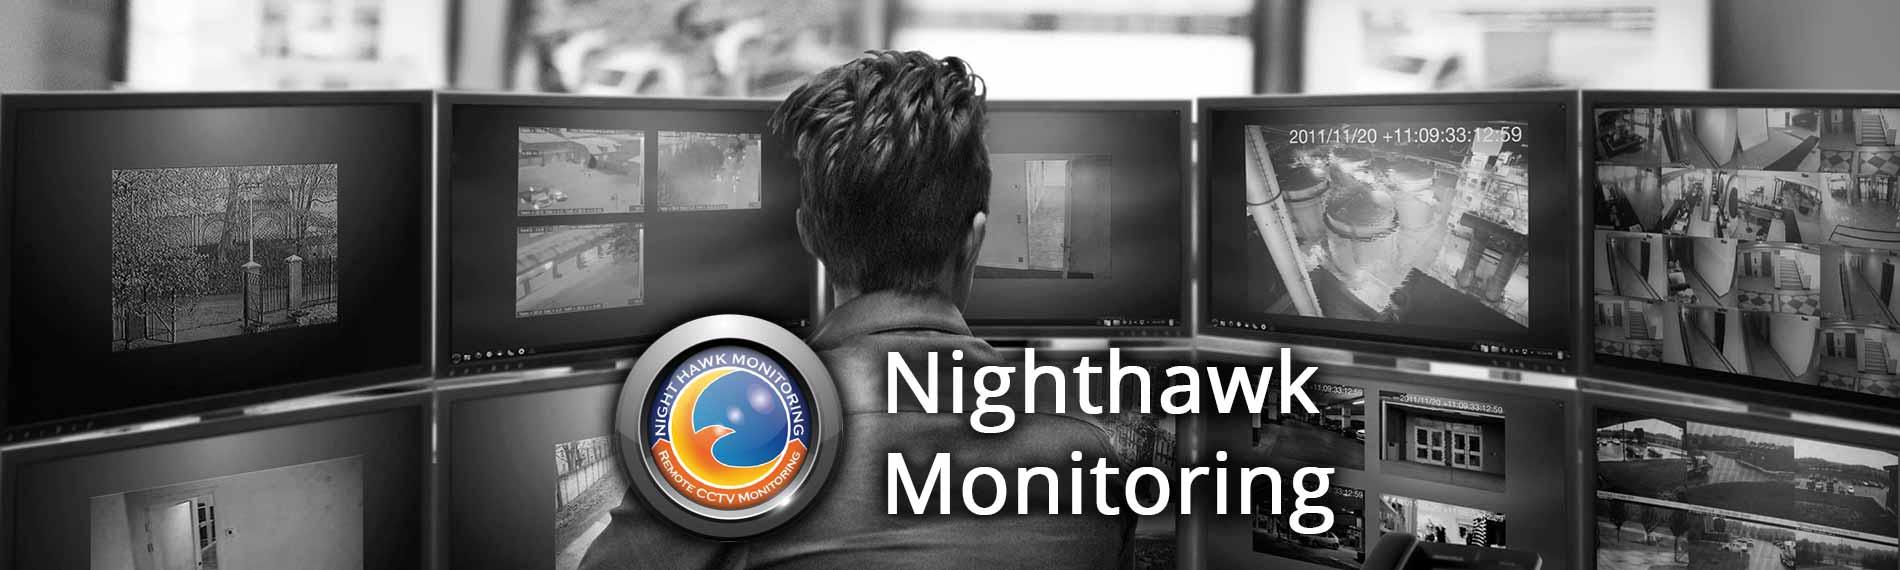 atlanta remote video surveillance security camera monitoring service. Black Bedroom Furniture Sets. Home Design Ideas